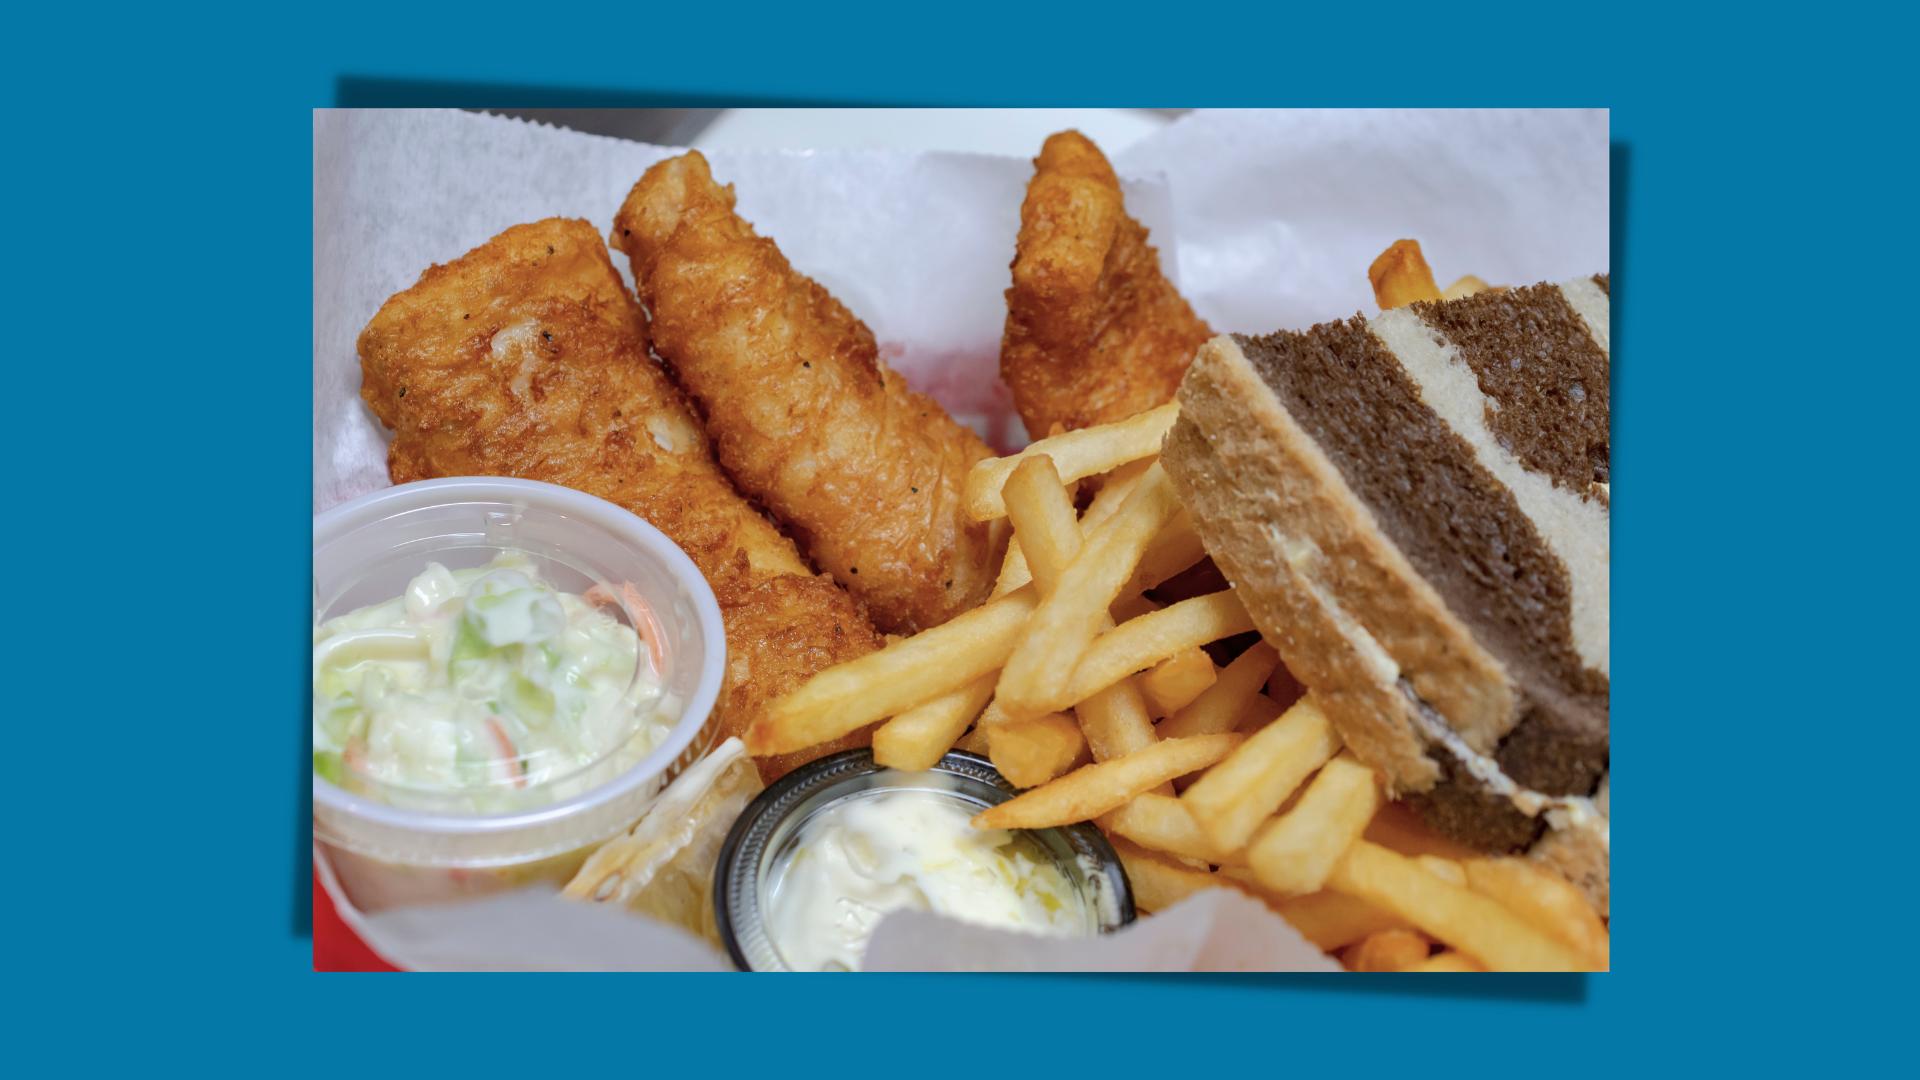 History of Wisconsin Fish Fry